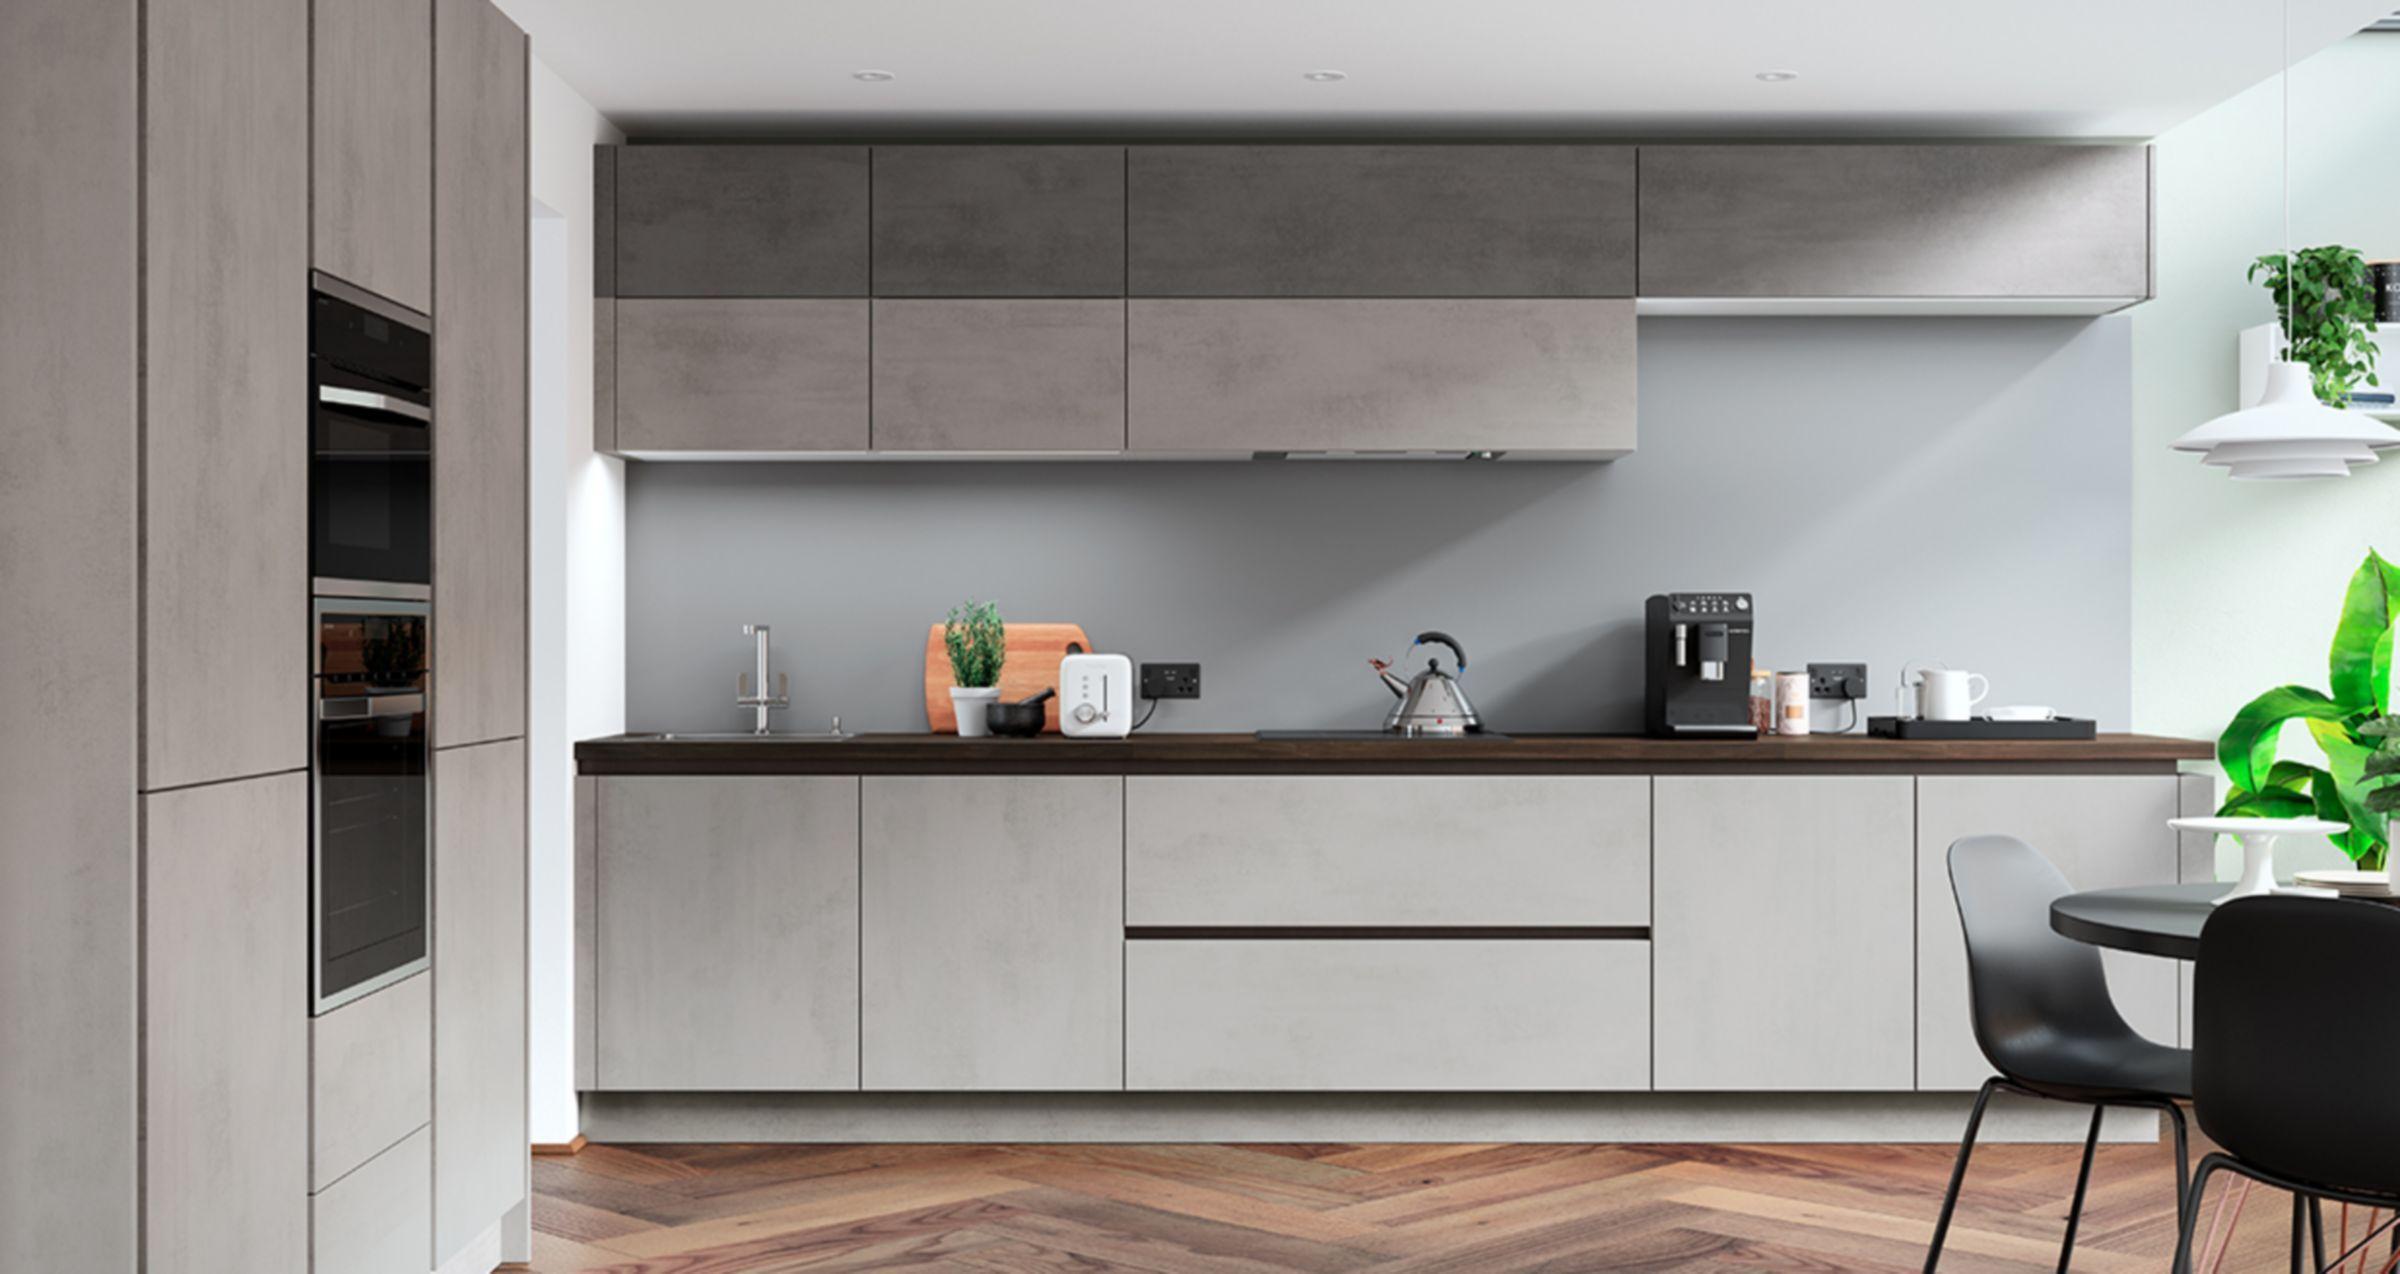 fittedkitchenservice Kitchen fittings, Kitchen